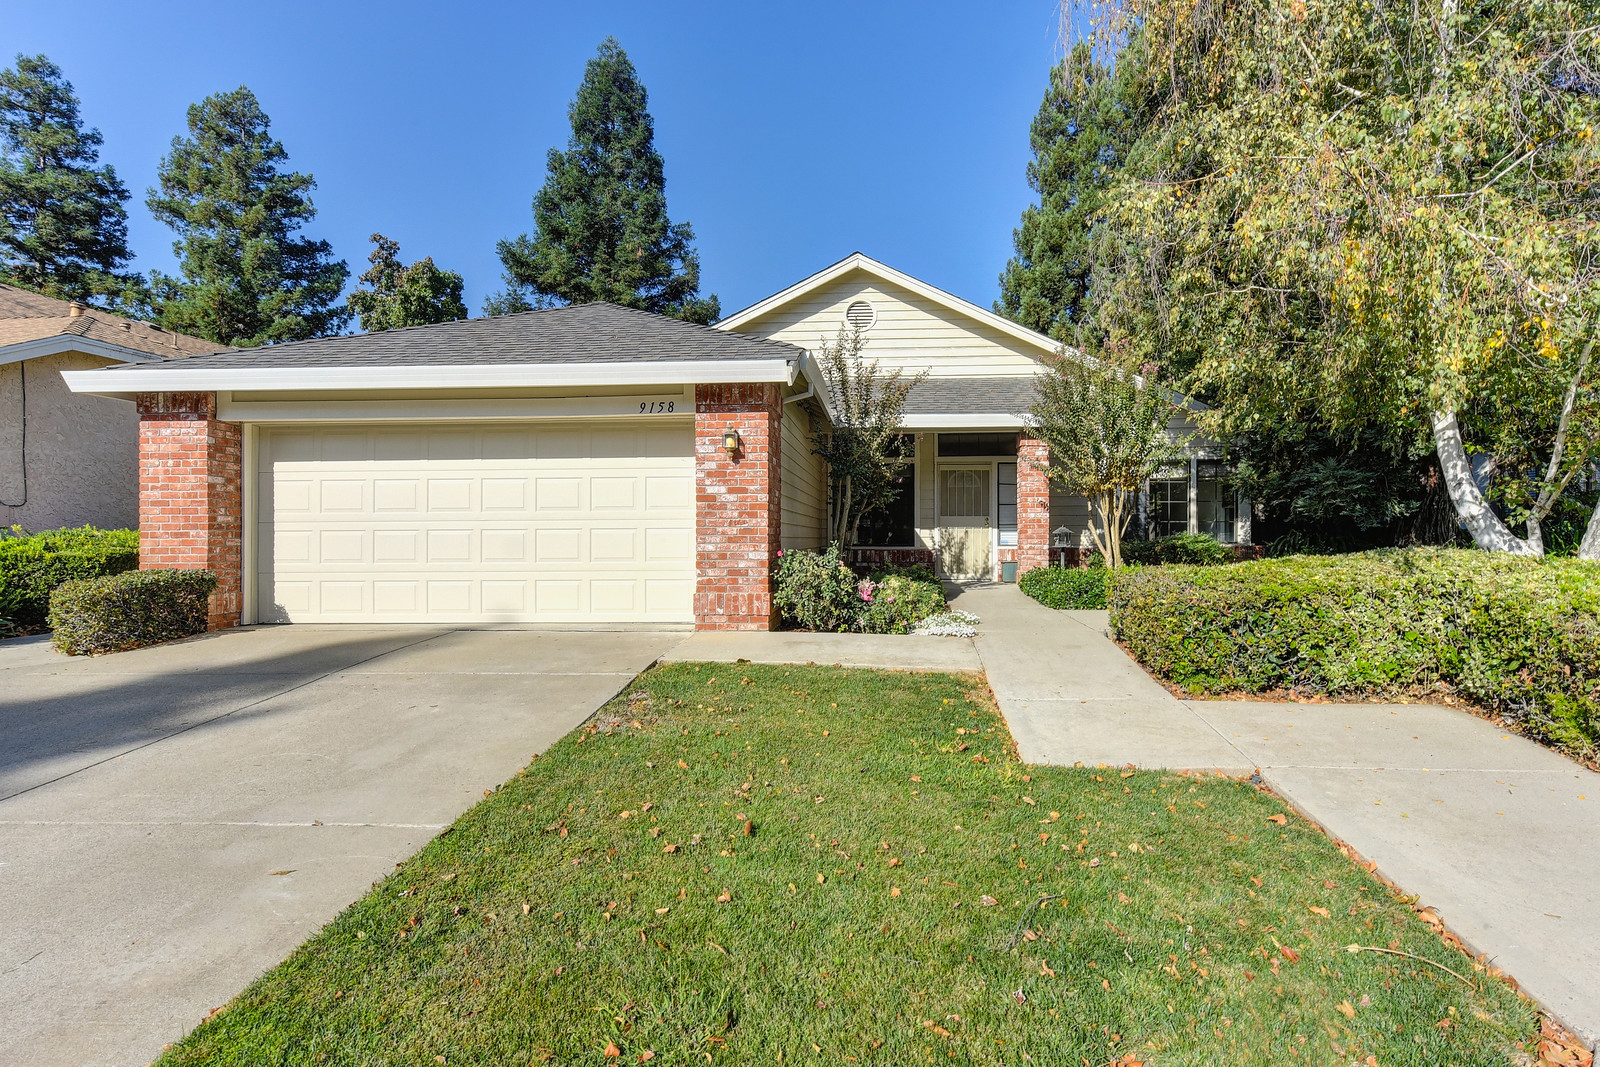 Elk Grove California single story home sold | Elk Grove California real estate agent Jesse Coffey